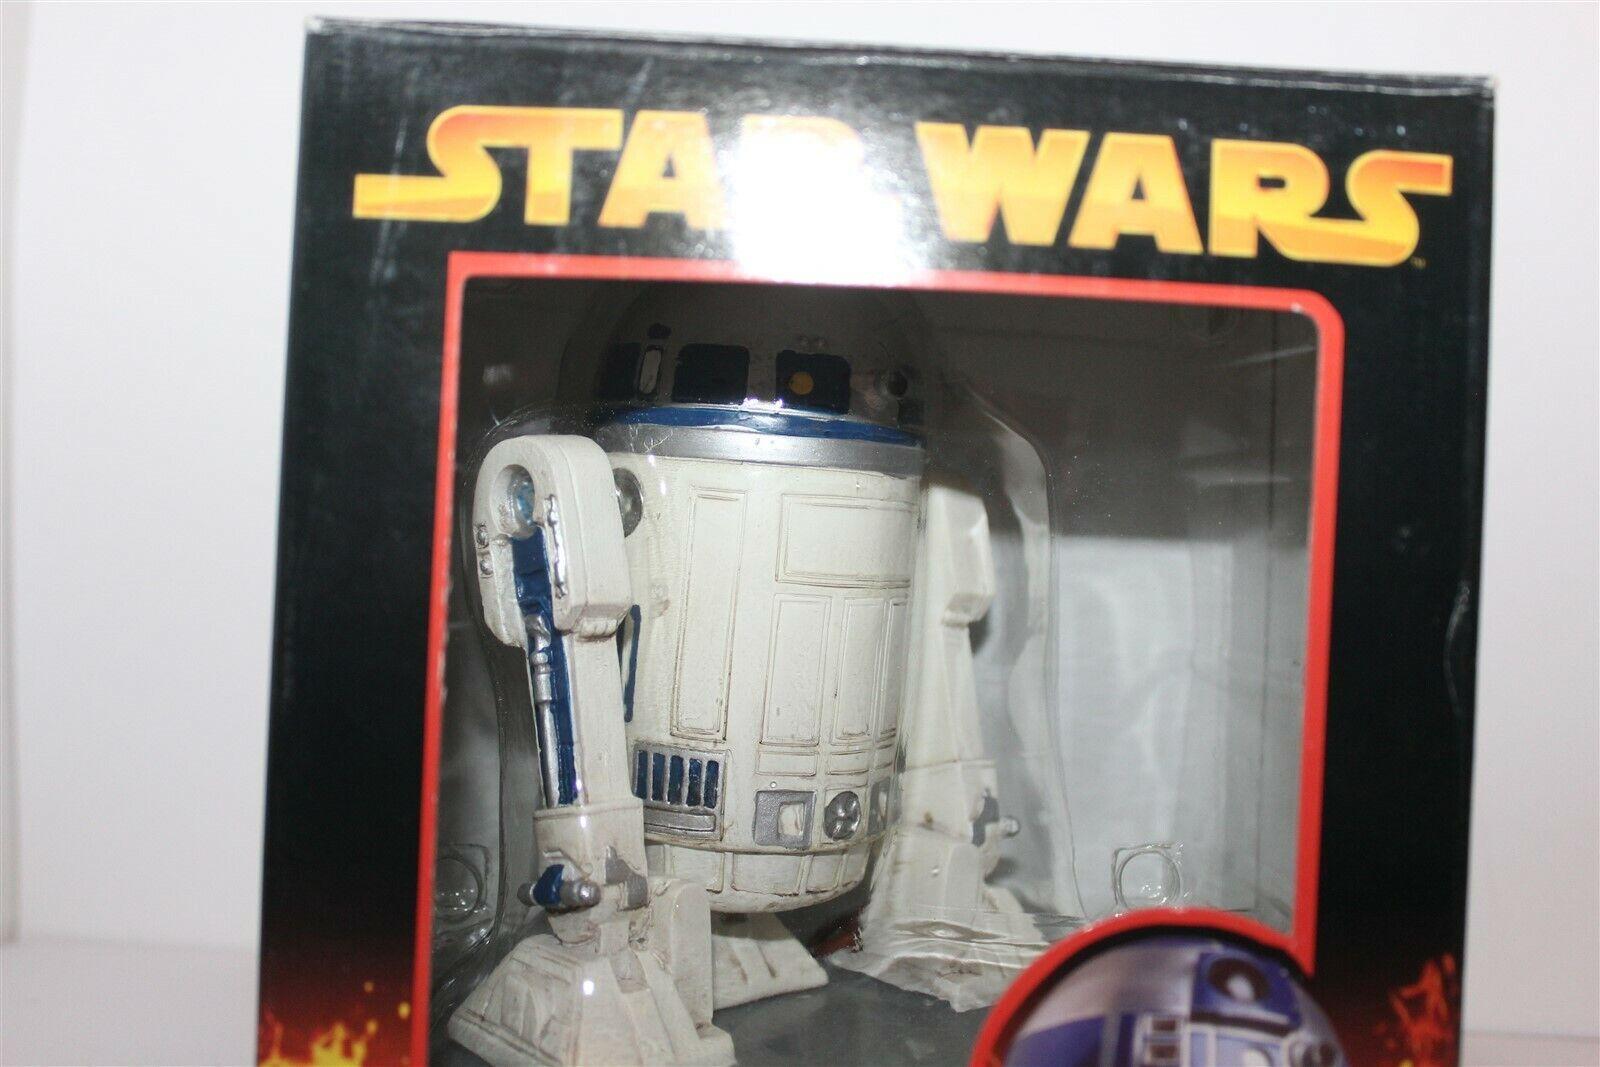 Star Wars R2-D2 Bobble Buddies Cards Inc.